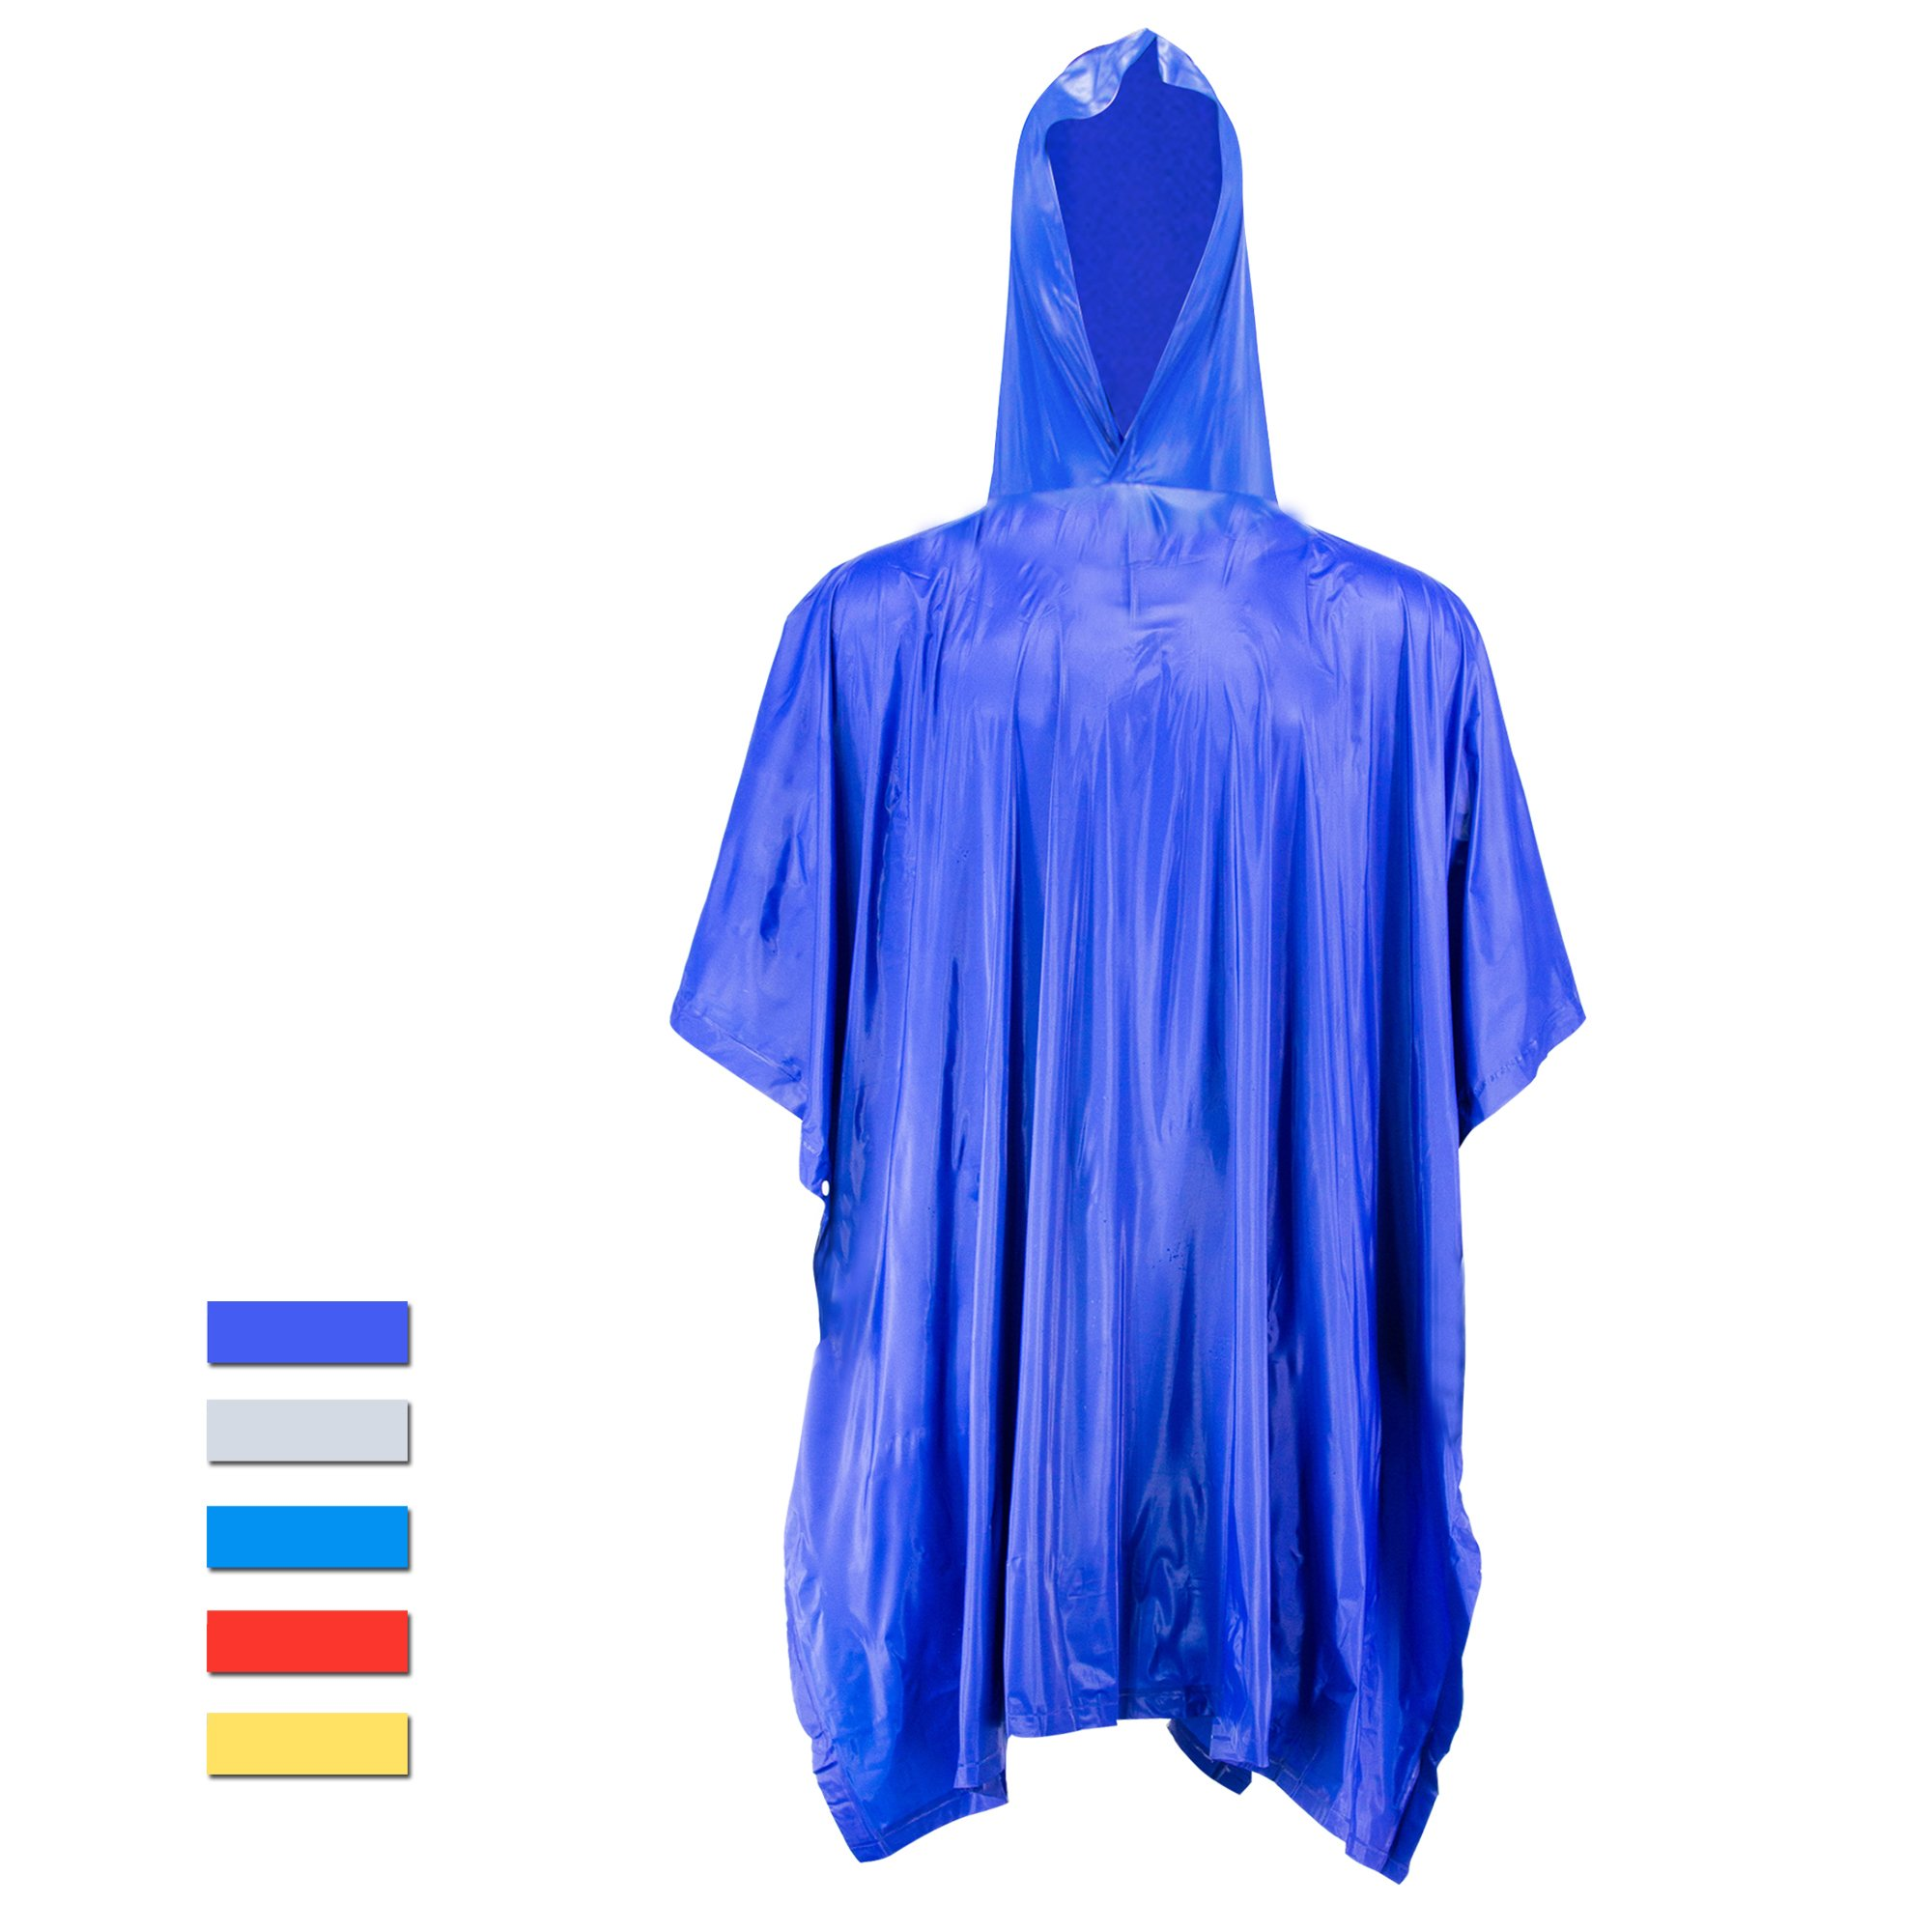 H&C Bike Rain Poncho Hoods and Sleeves,Blue-super Large,One Size